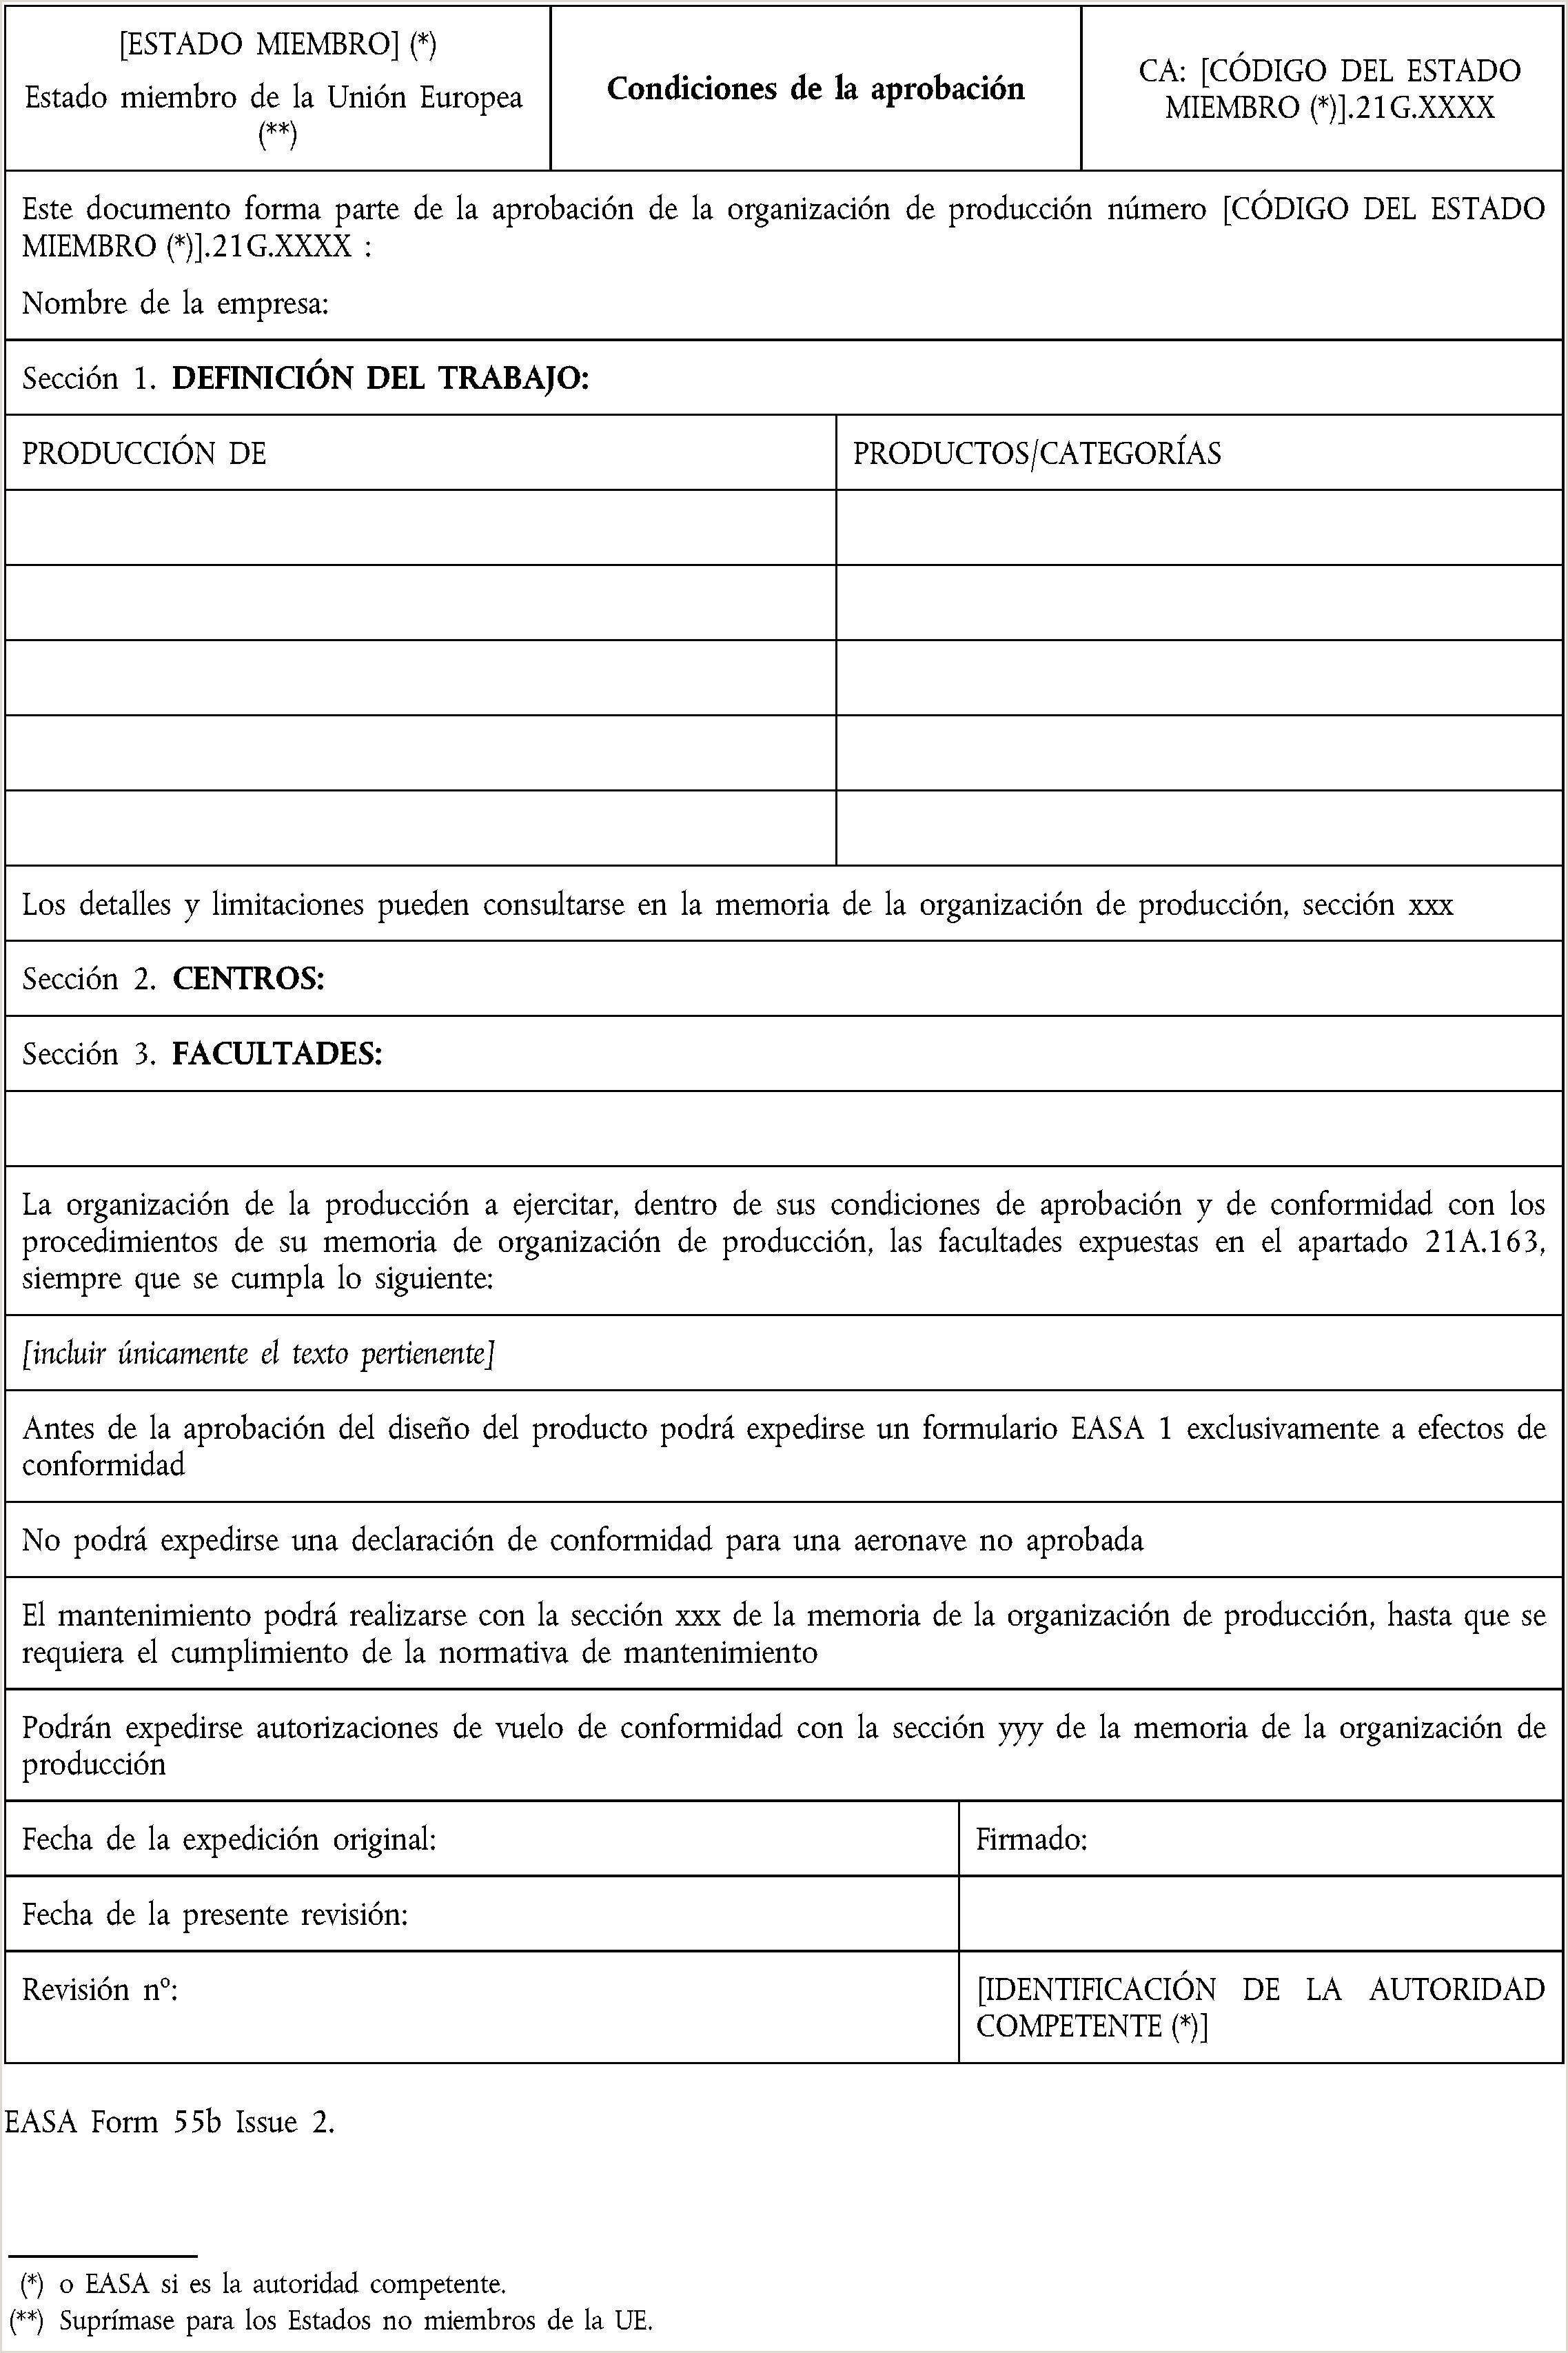 Formato Unico De Hoja De Vida Imprimir Eur Lex R0748 En Eur Lex